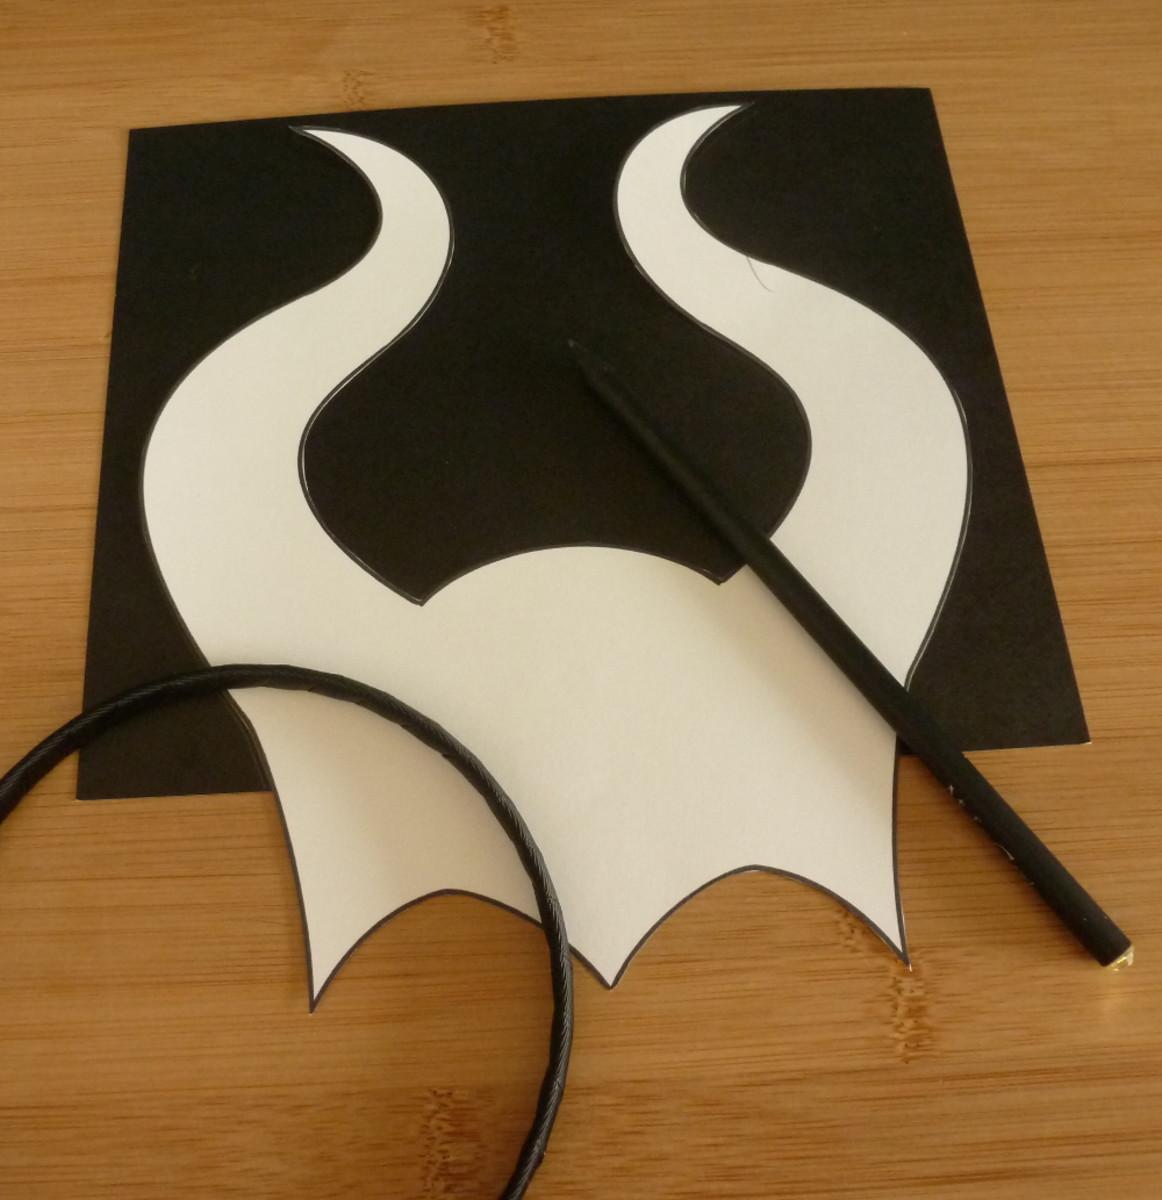 DIY Maleficent Angelina Jolie Horned Horns Headband Costume Accessory DIY How to Tutorial Craft